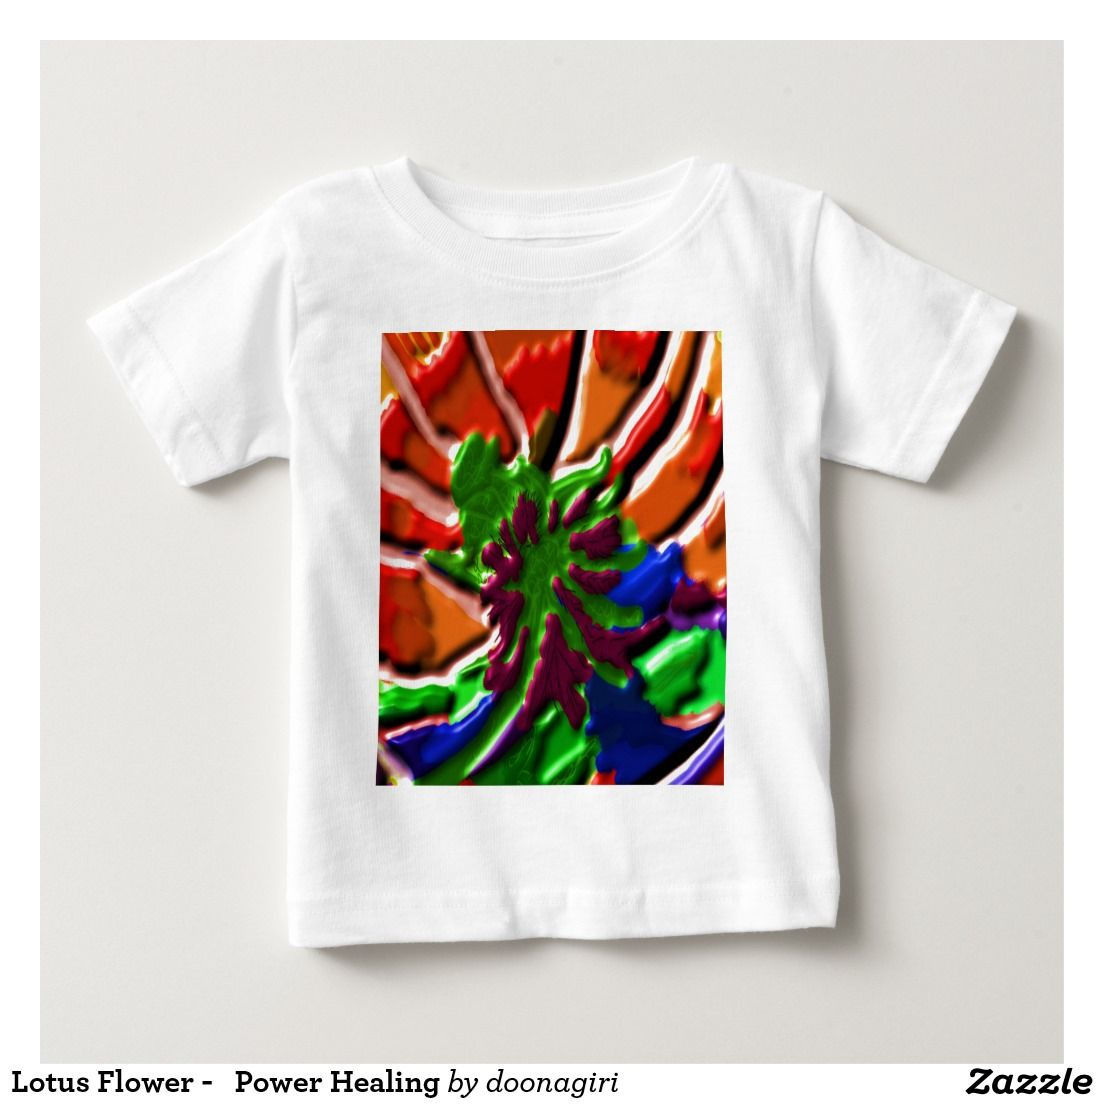 Lotus flower power healing baby t shirt 101 zazzle pro favorite lotus flower power healing baby t shirt izmirmasajfo Images